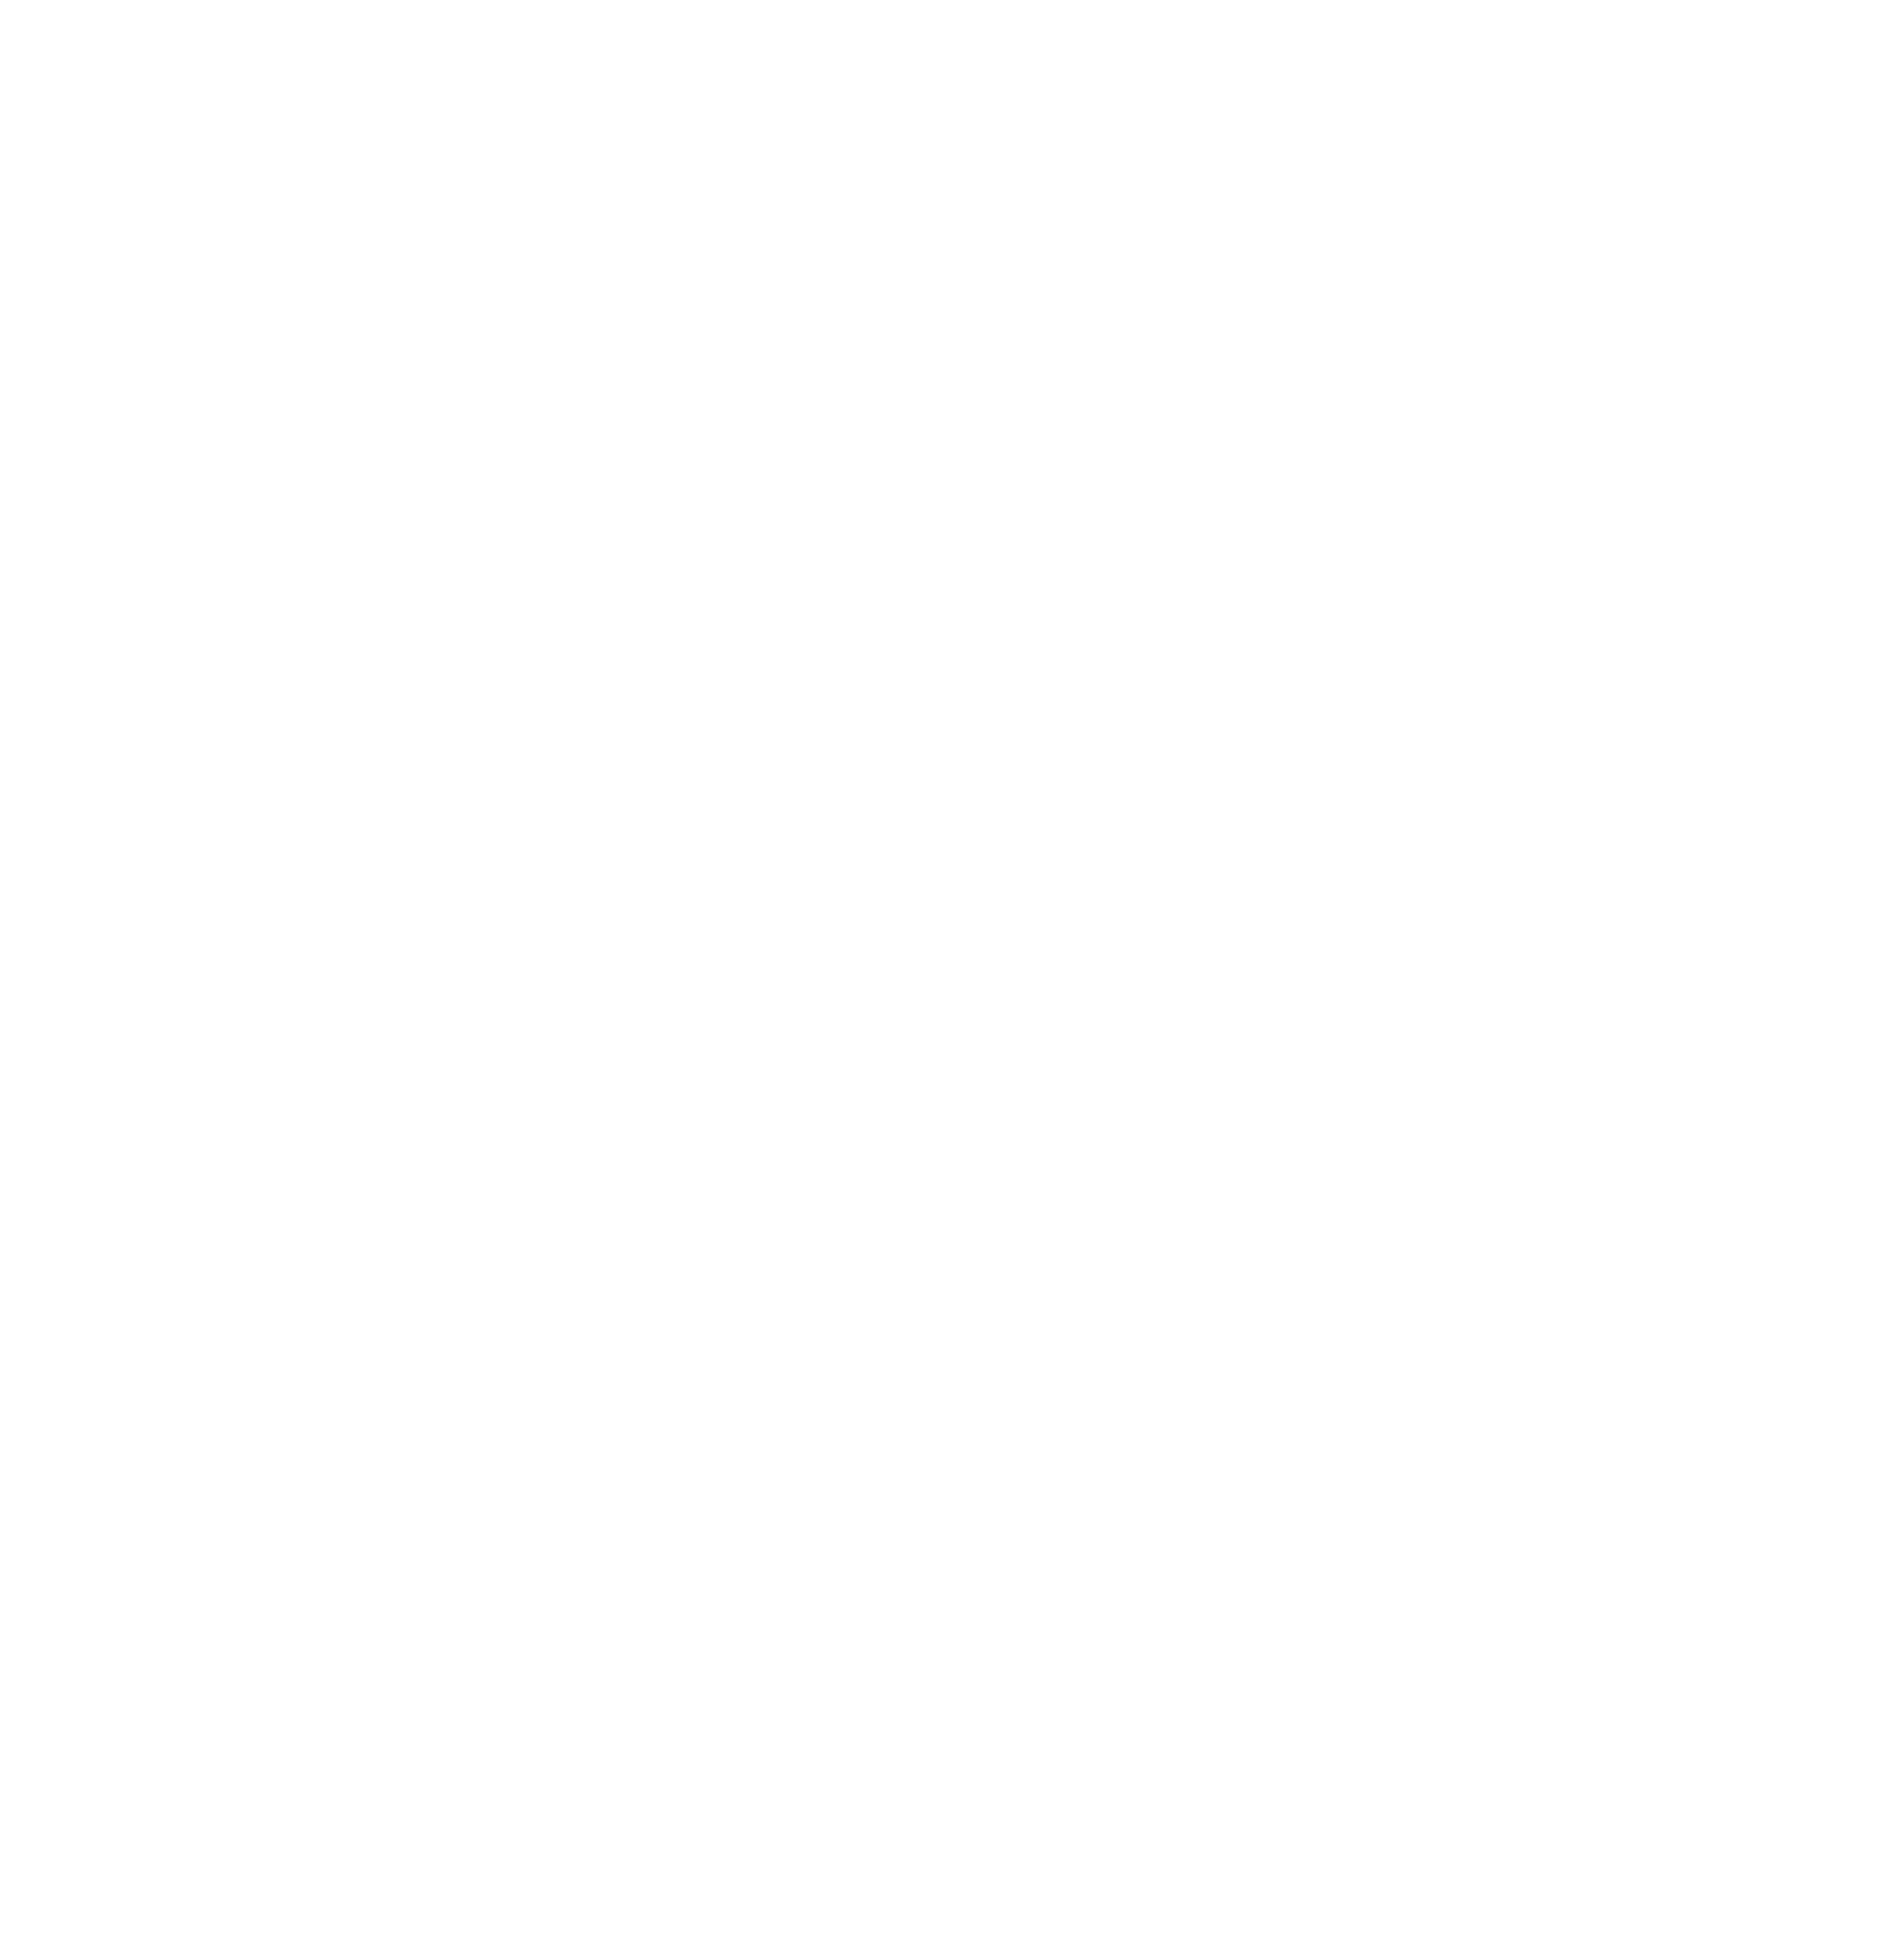 Lamborghini Gallardo T-Shirt Design